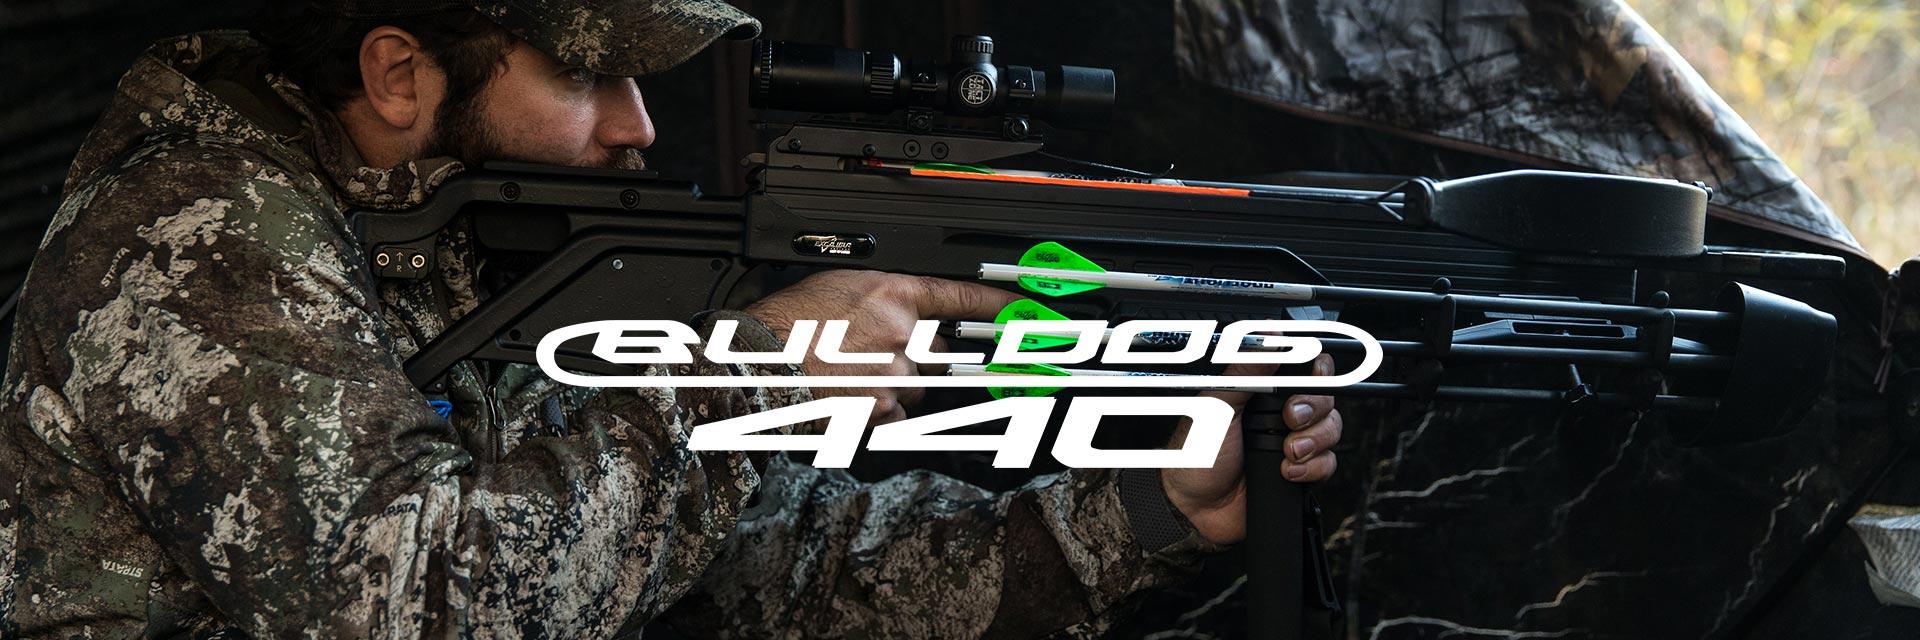 Excalibur Bulldog 440 crossbow in camo